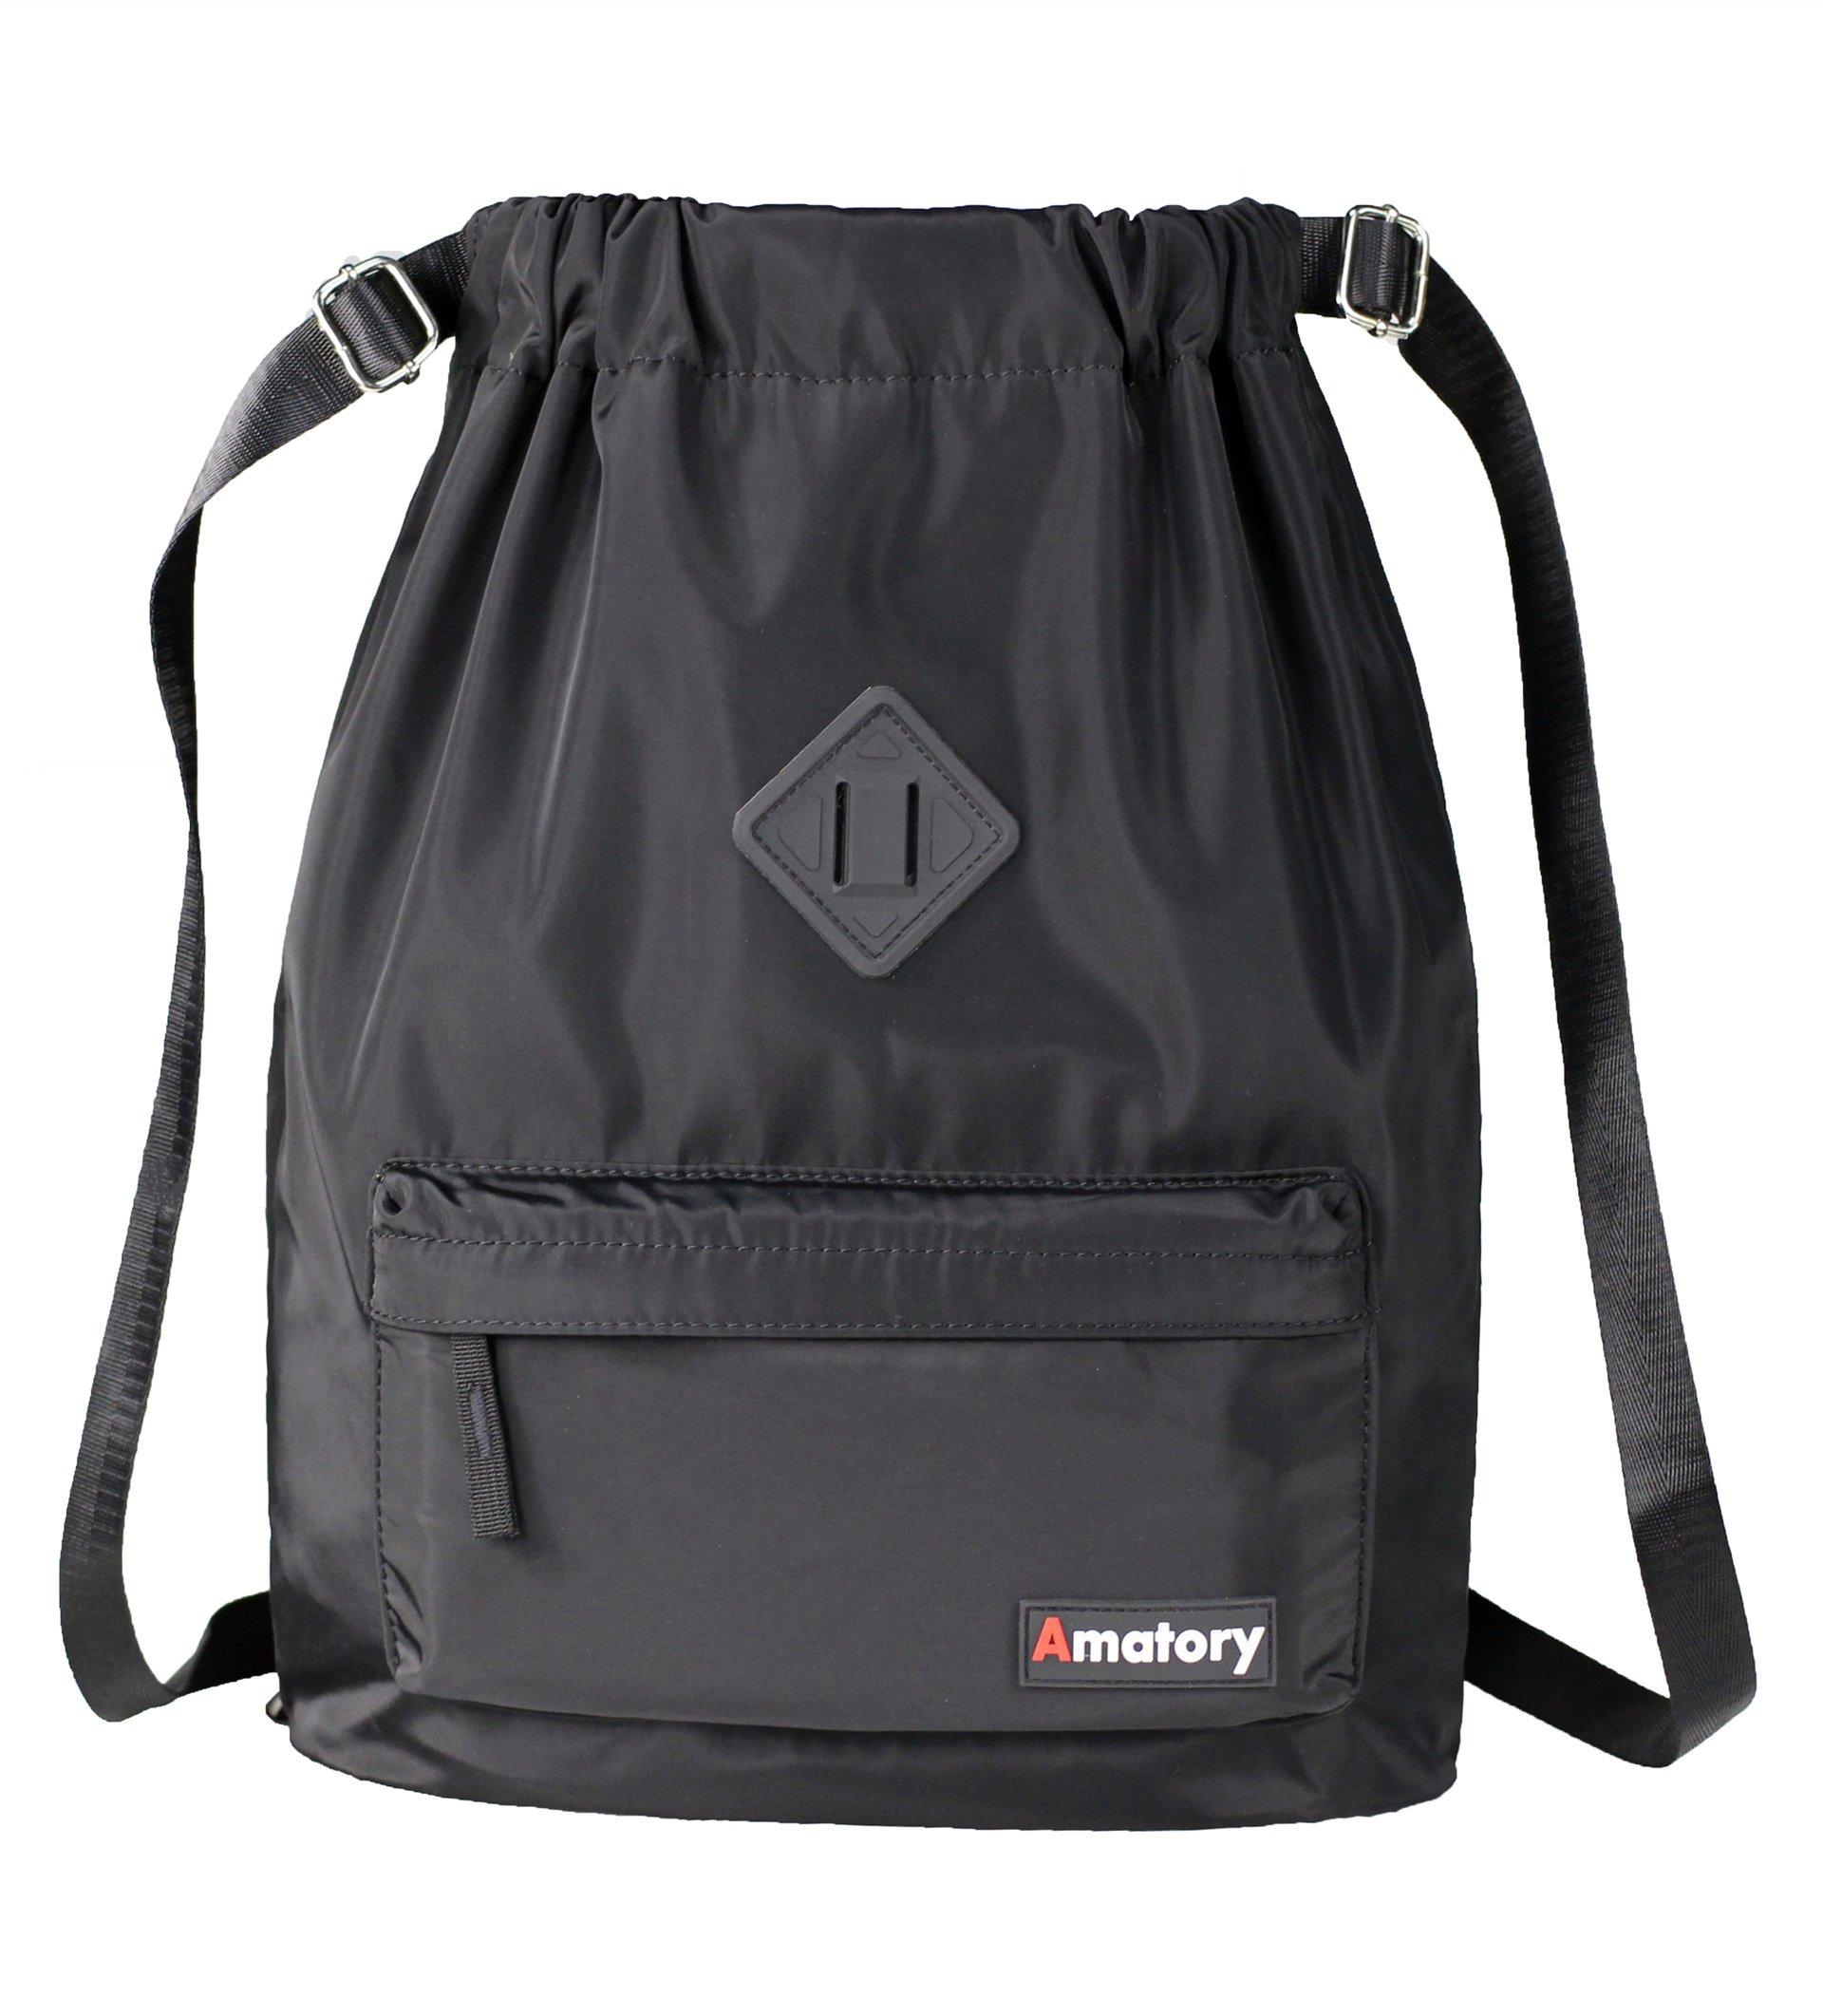 Drawstring Backpack String Bag Sports Waterproof Sackpack Gymsack Gym Cinch Sack (Black)